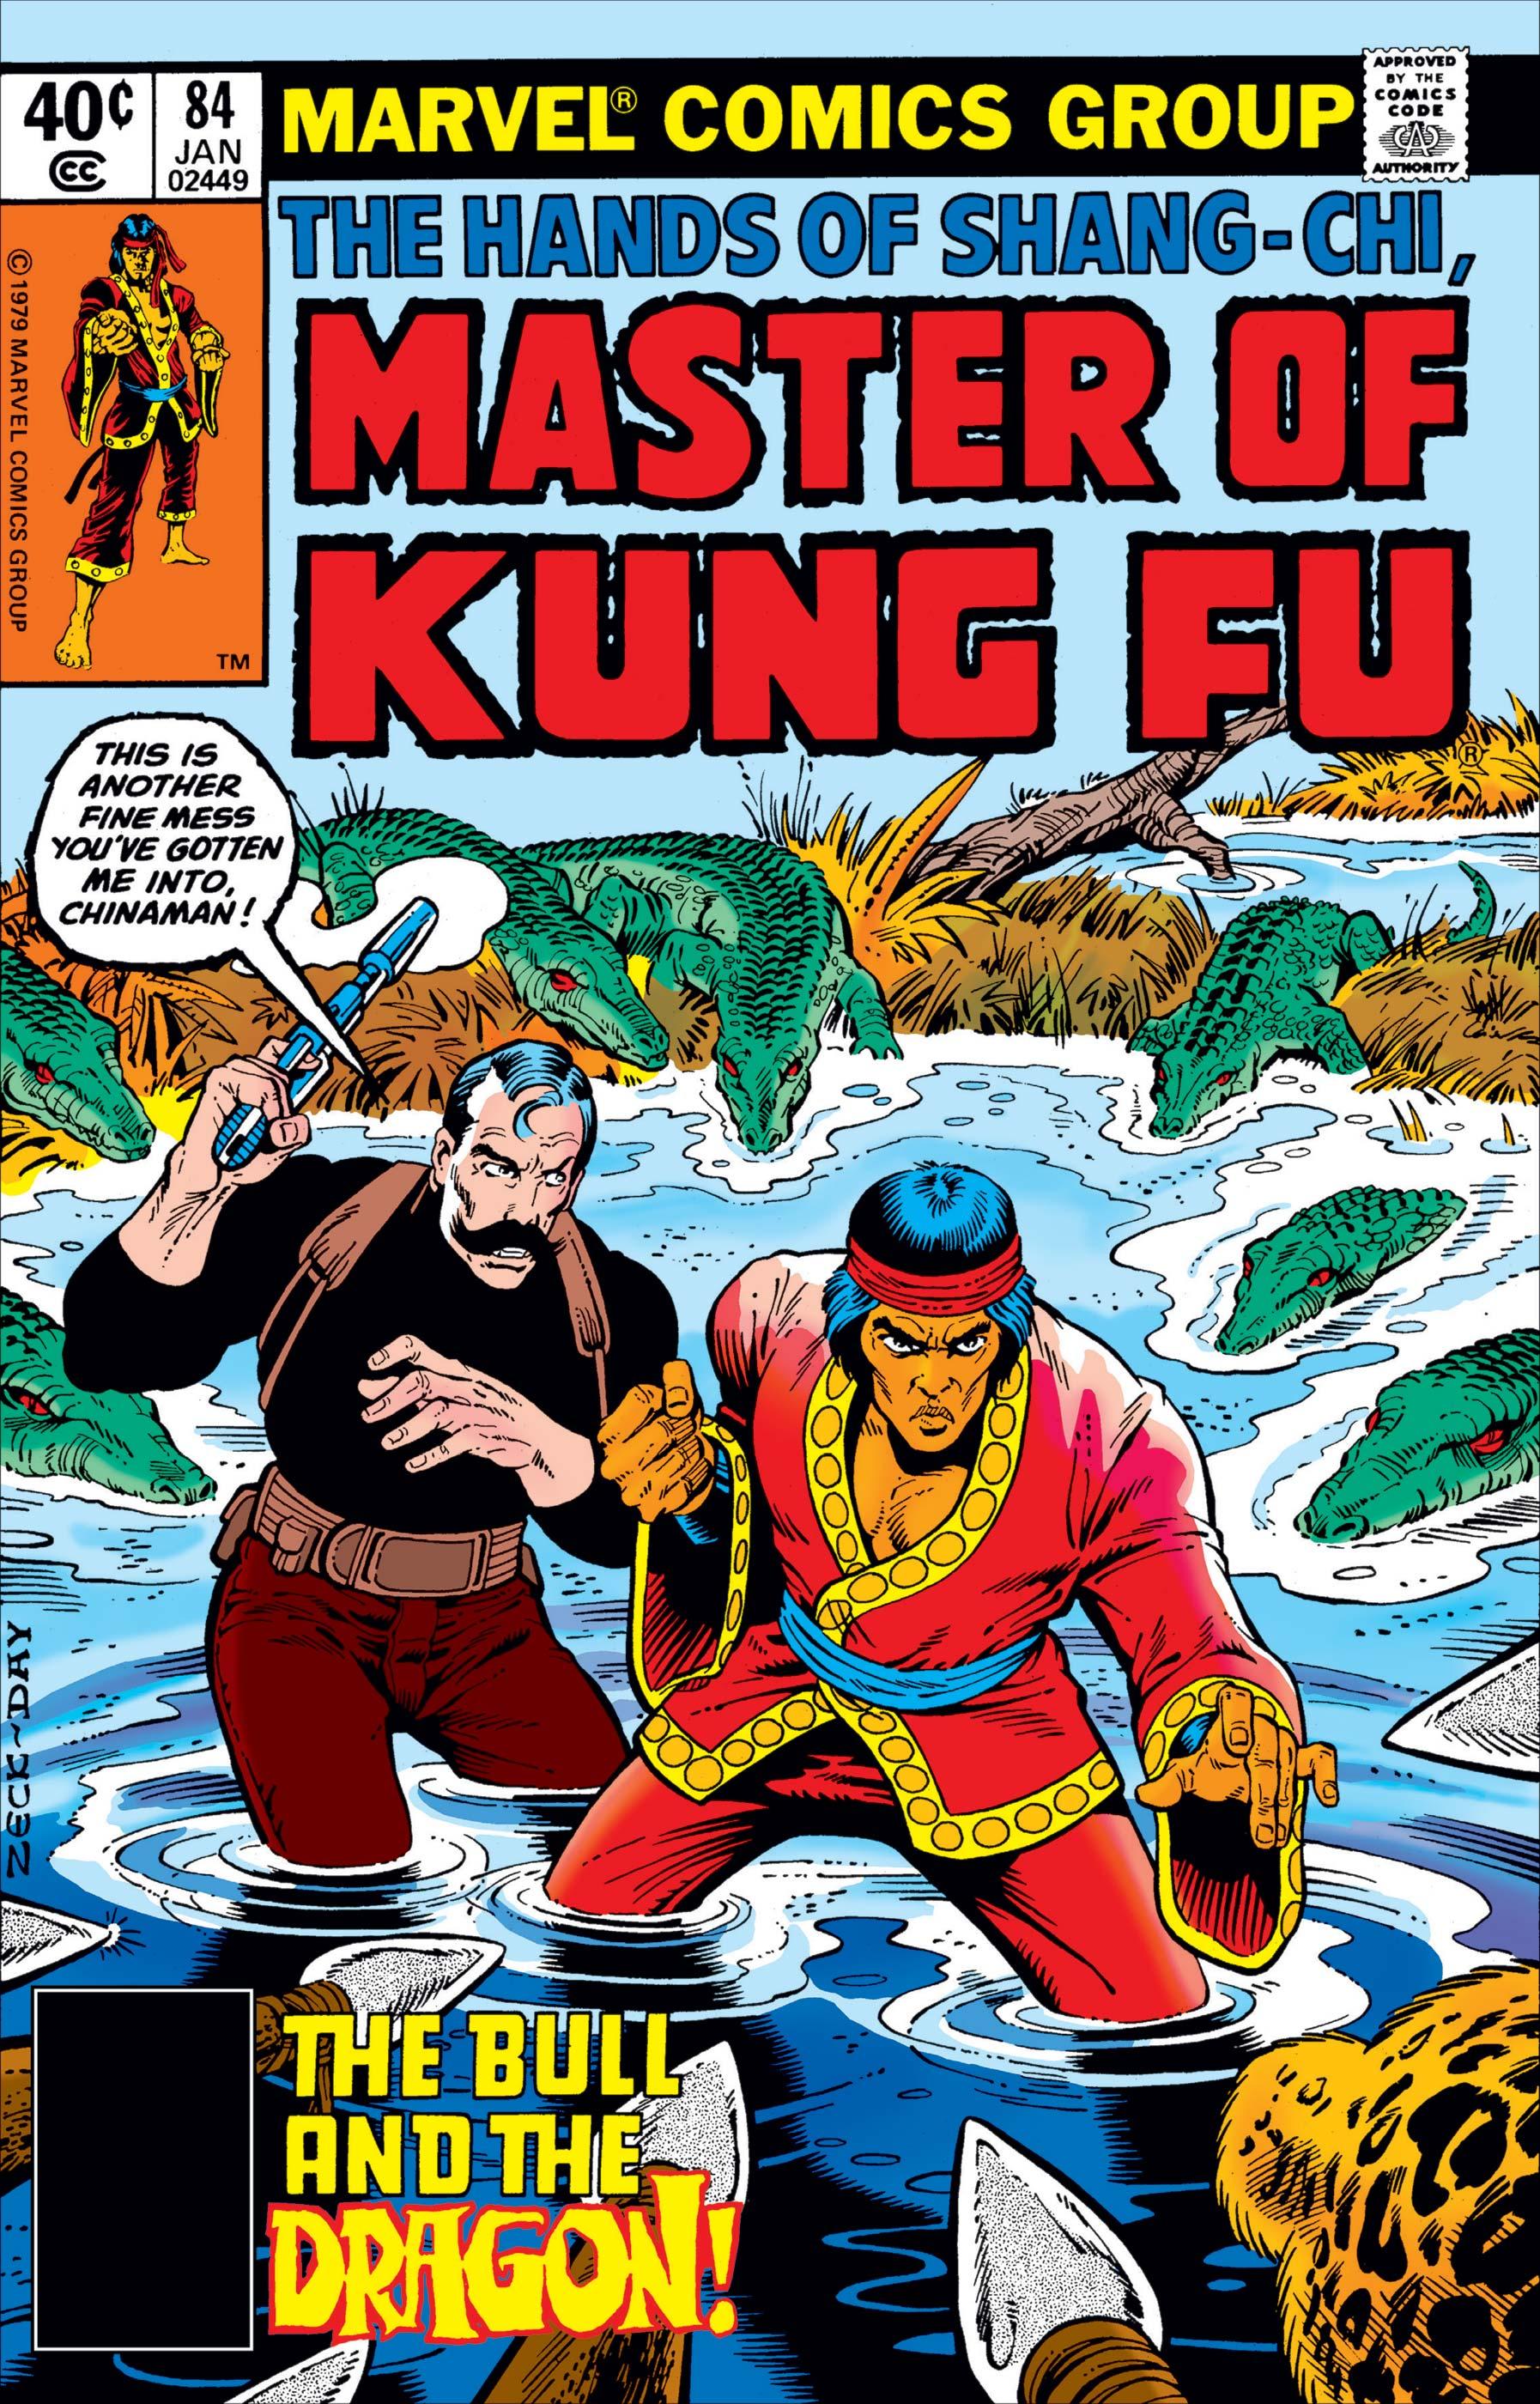 Master of Kung Fu (1974) #84